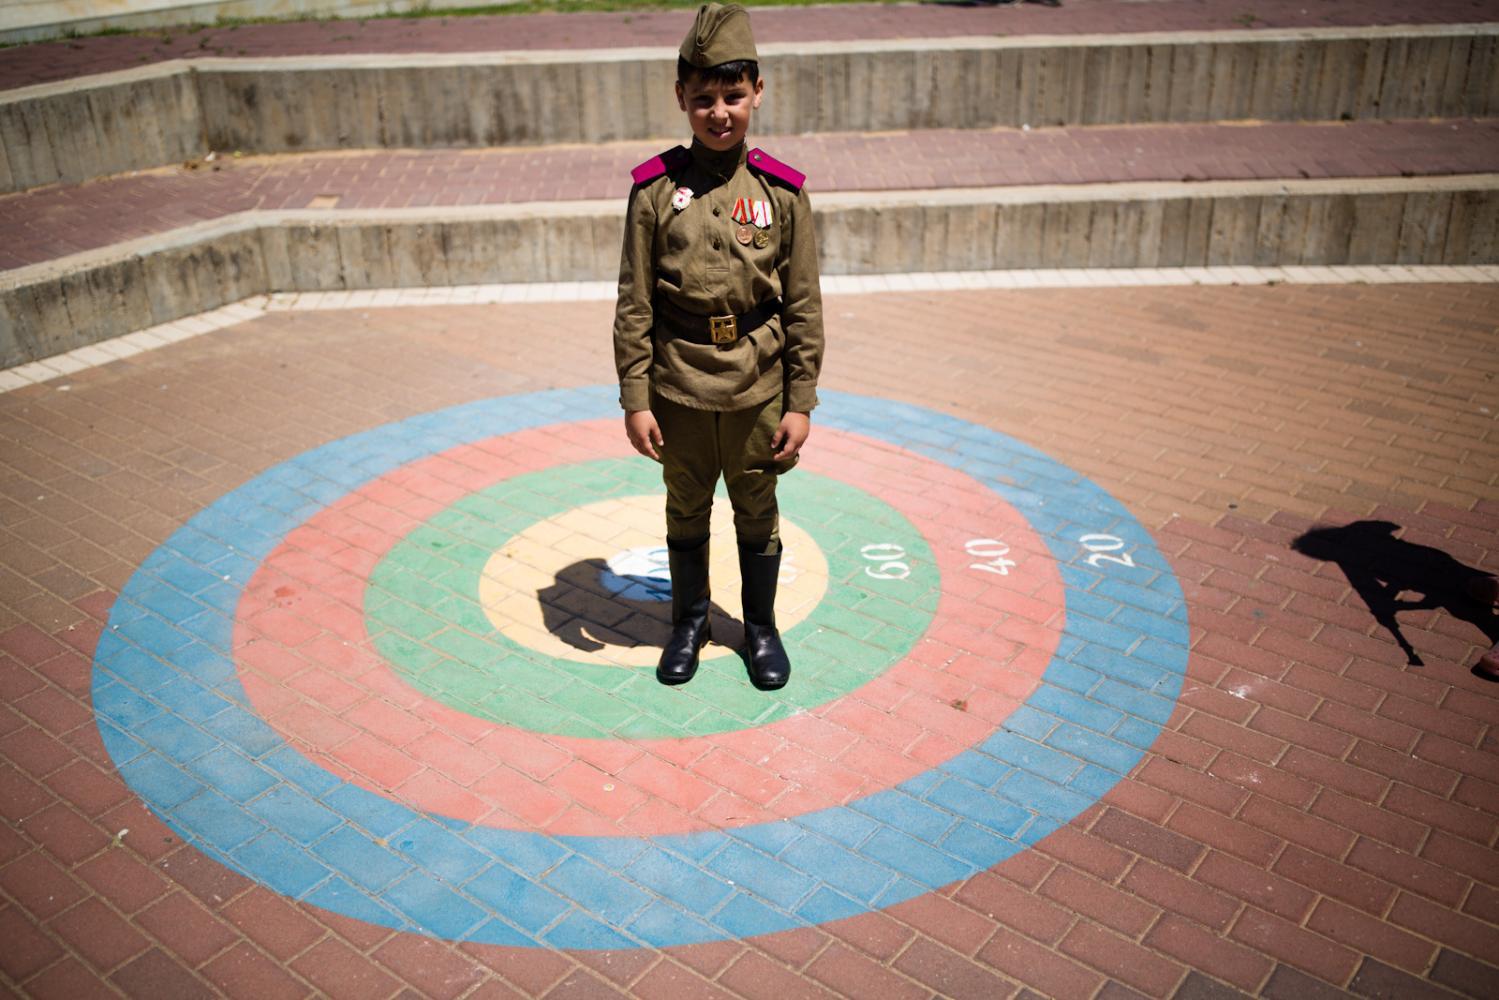 Photography image - Loading b60454e3cdadcba6-CK_Israel_Veterans_02.jpg